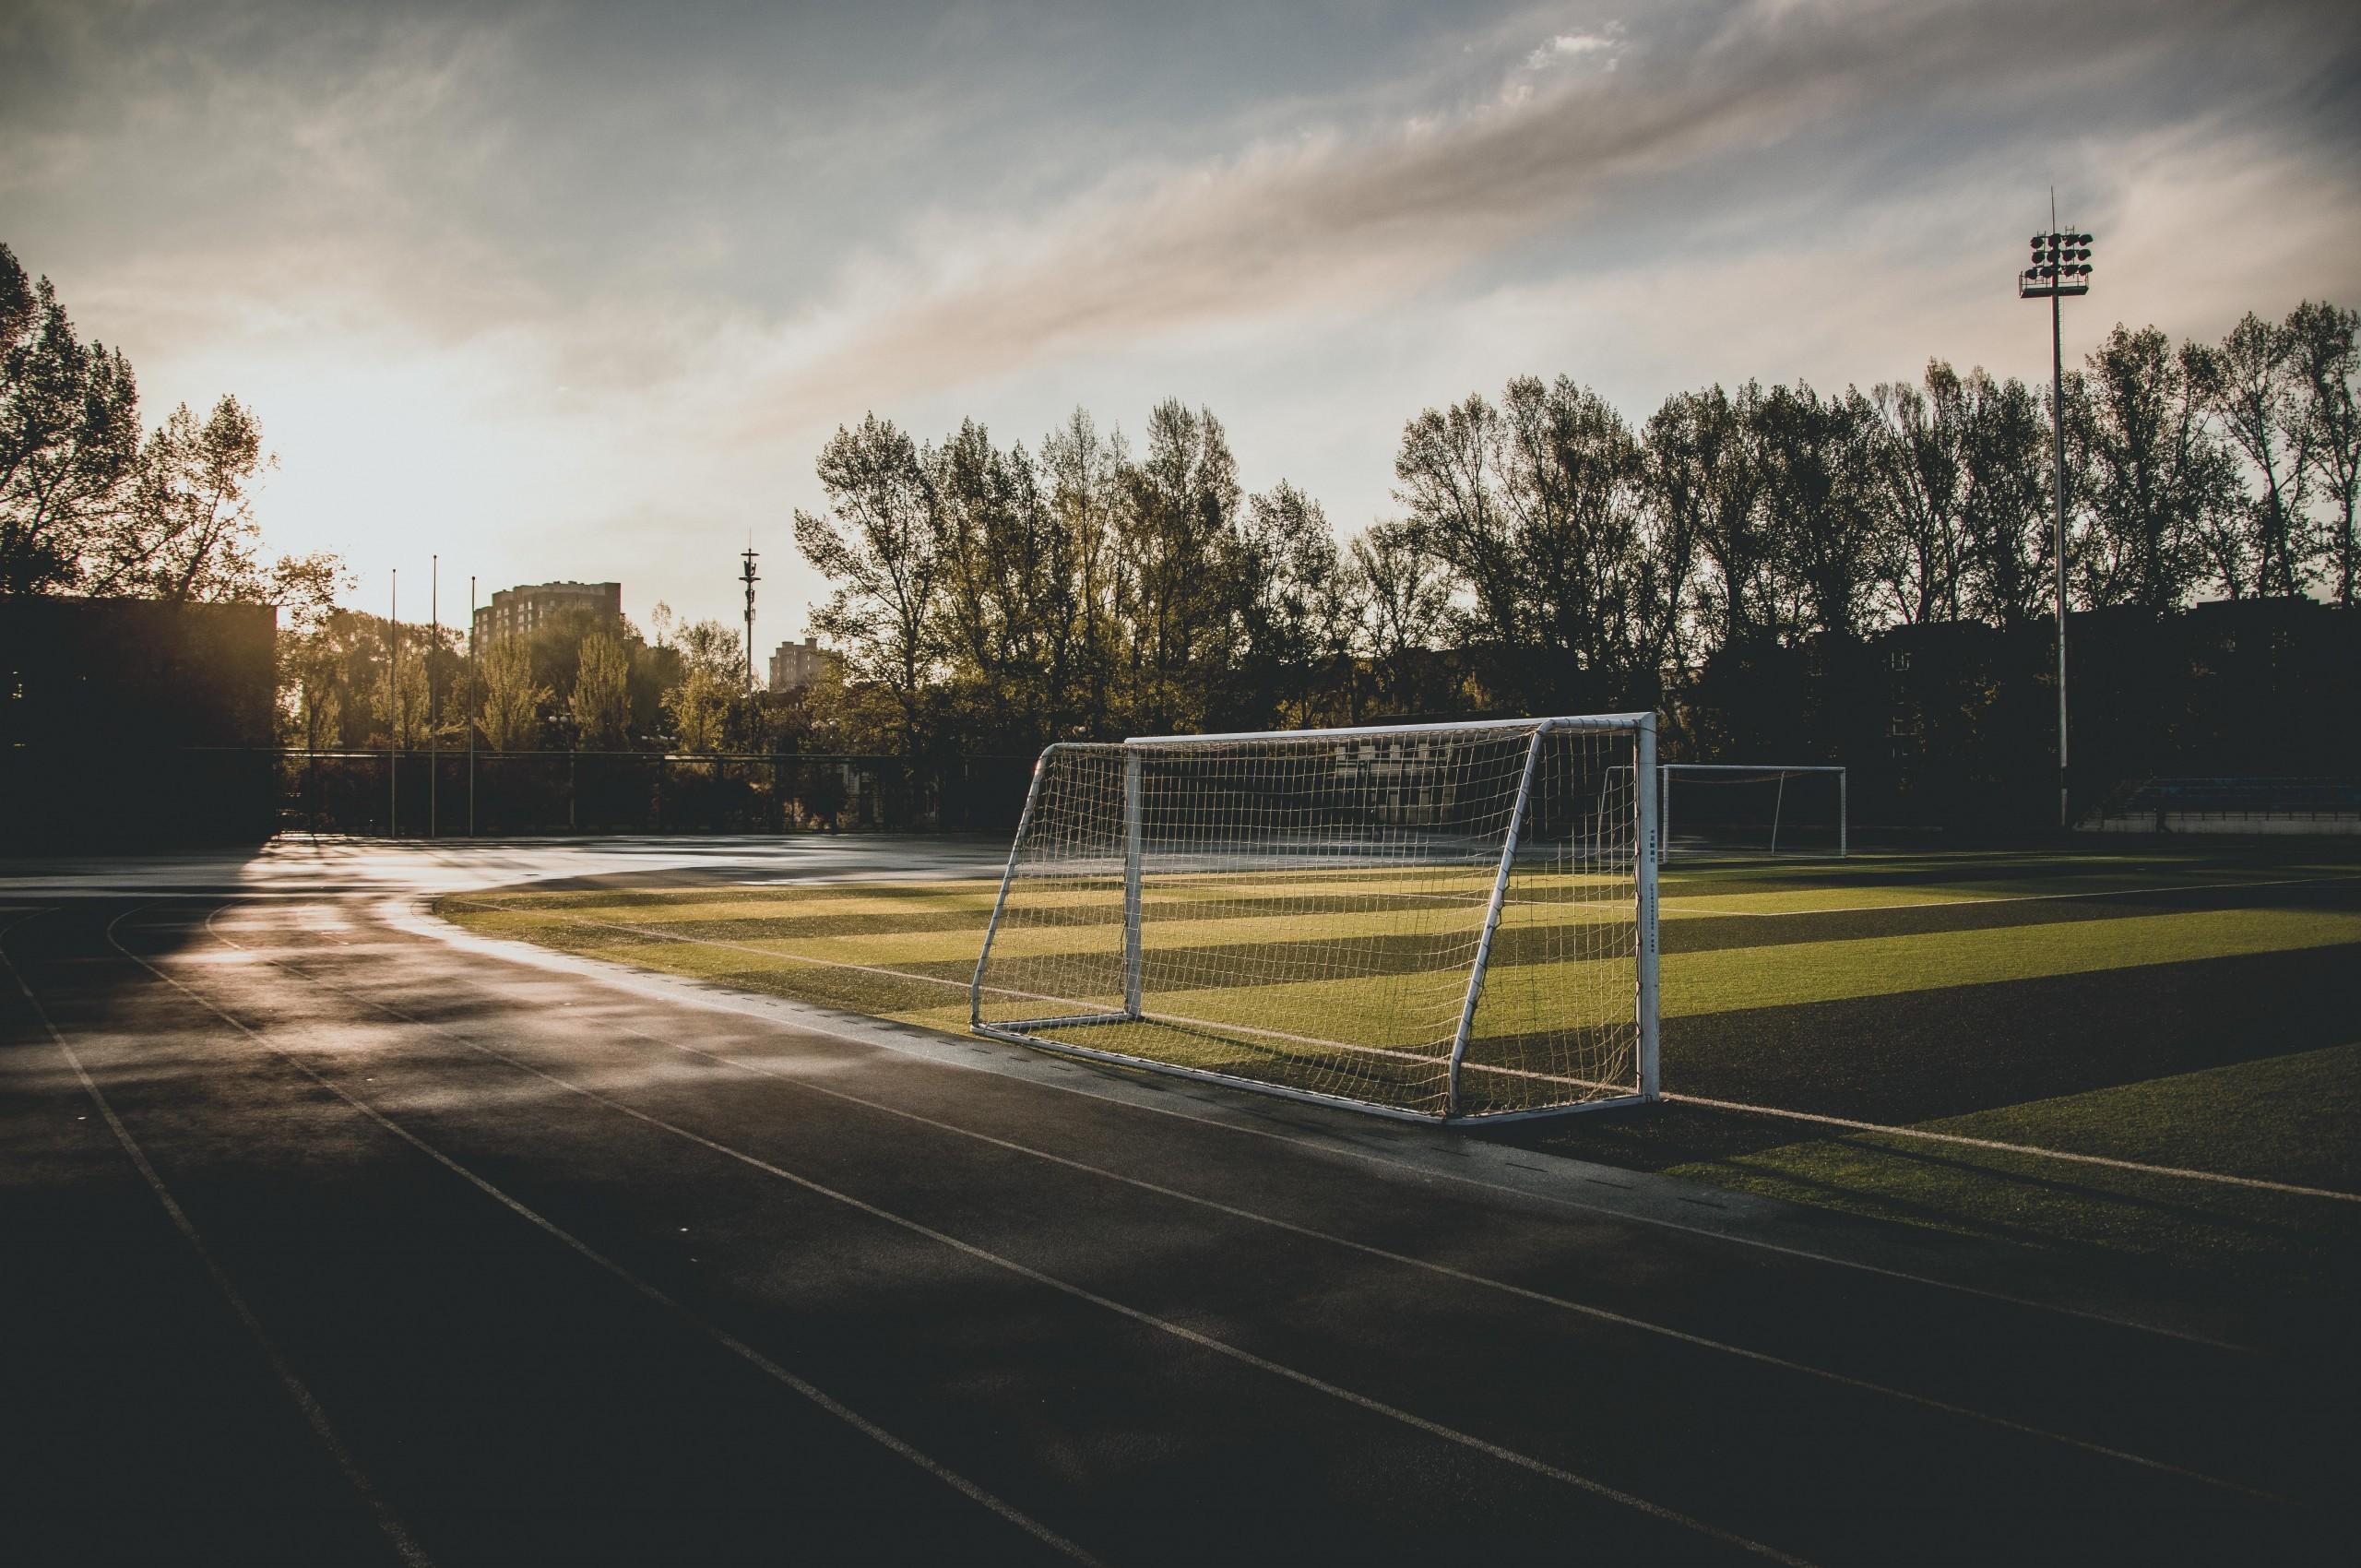 soccer goal hd wallpaper 73904